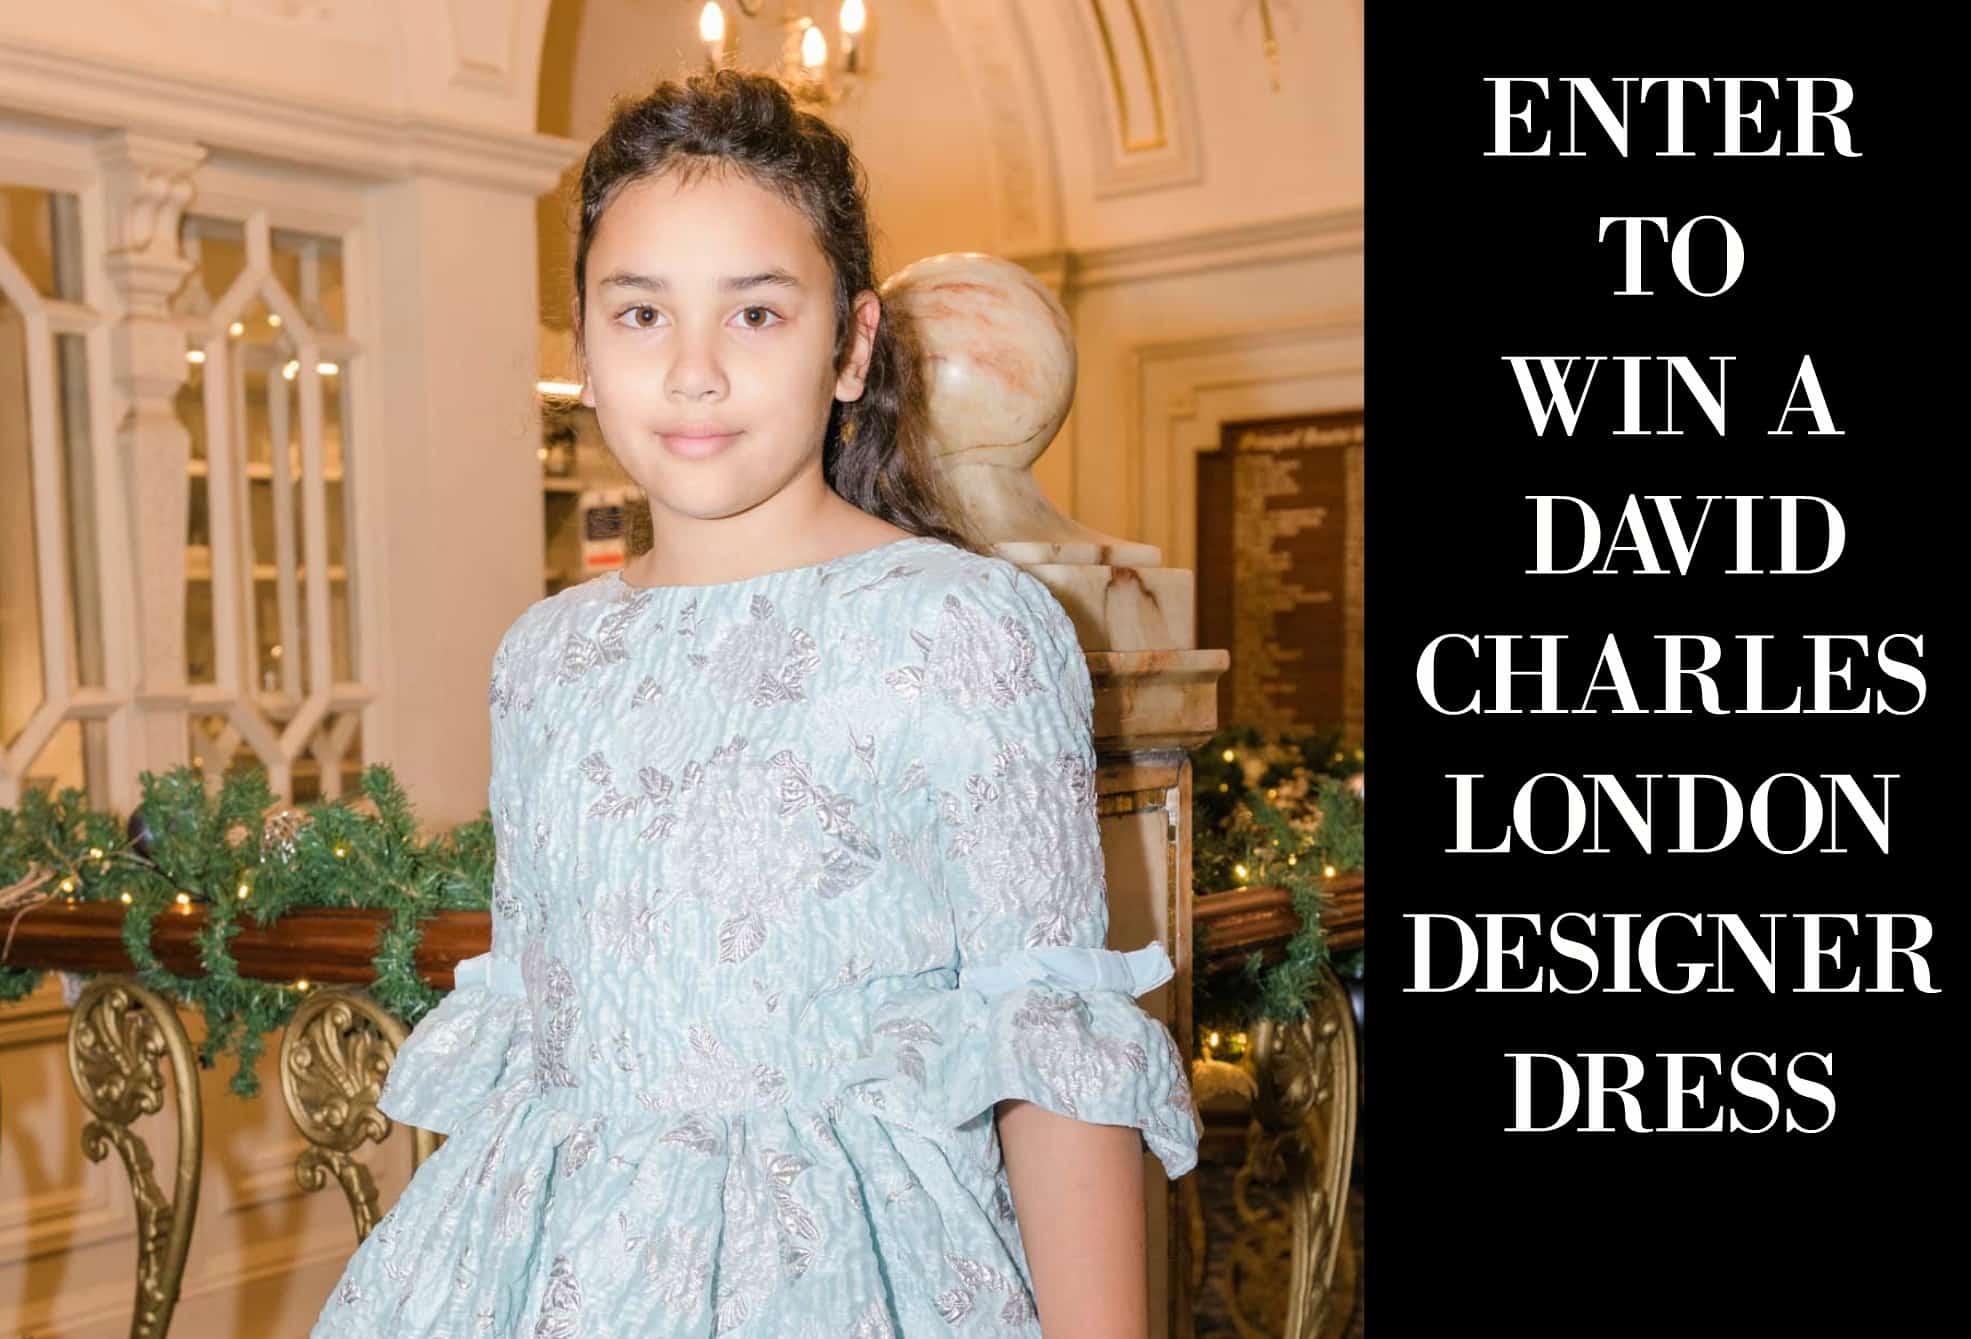 David Charles London Opera Gown